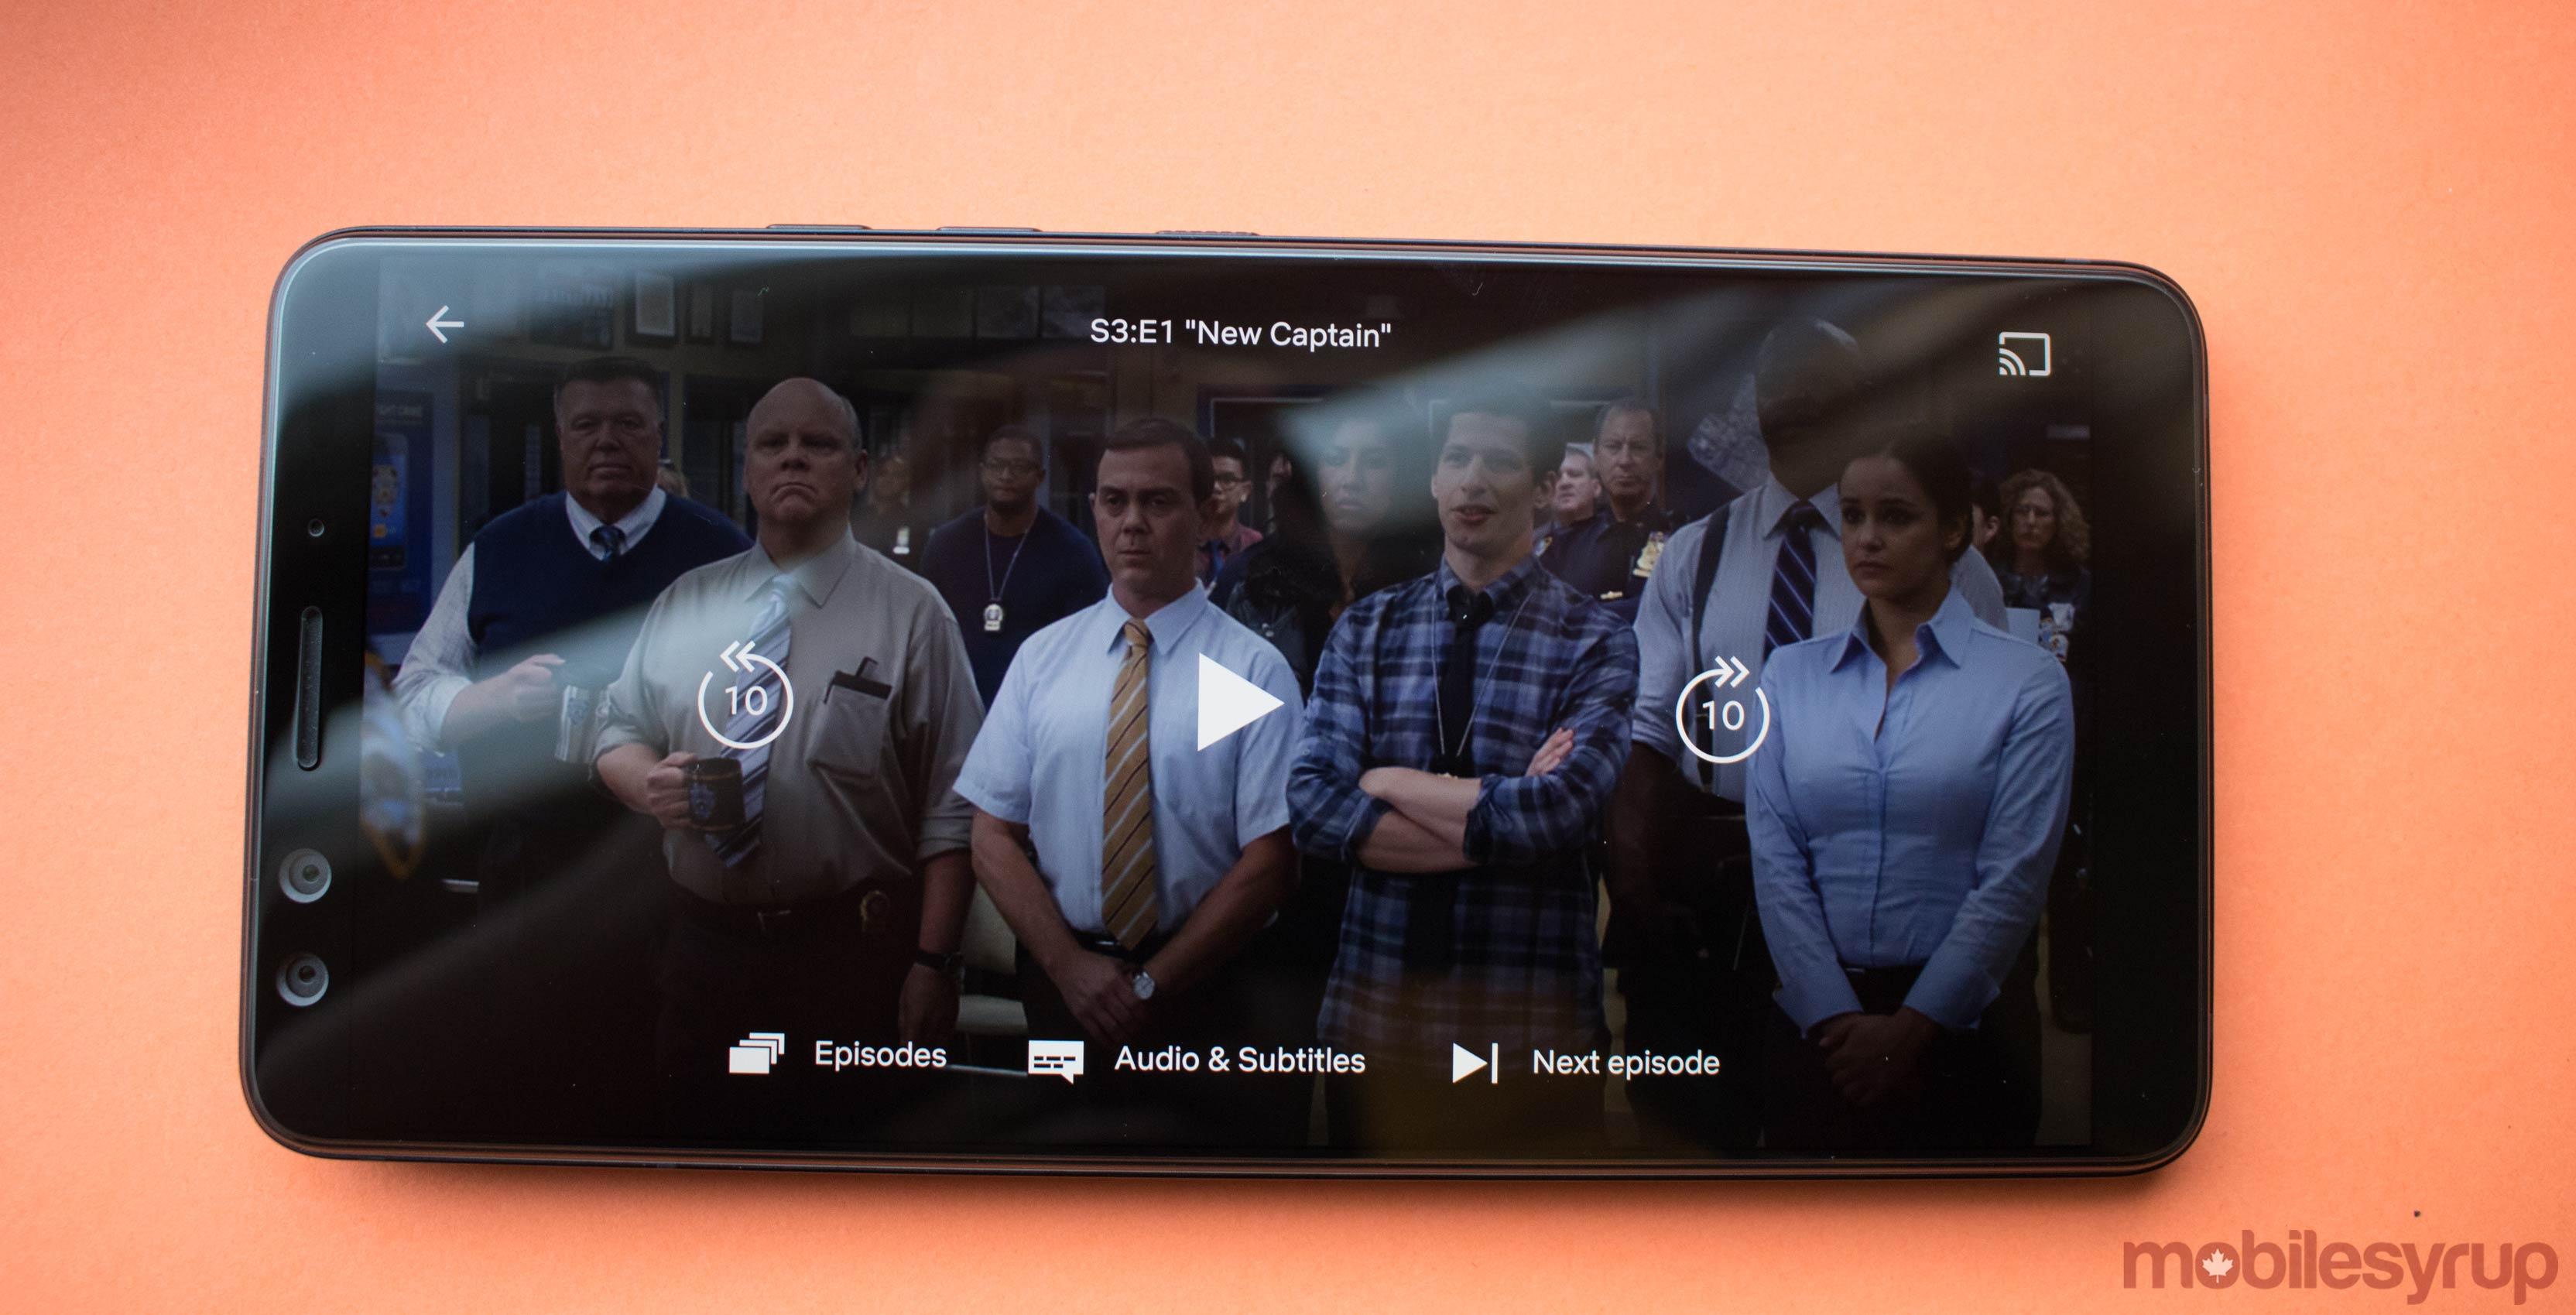 Netflix update button arrangement with Brooklyn Nine Nine in the background